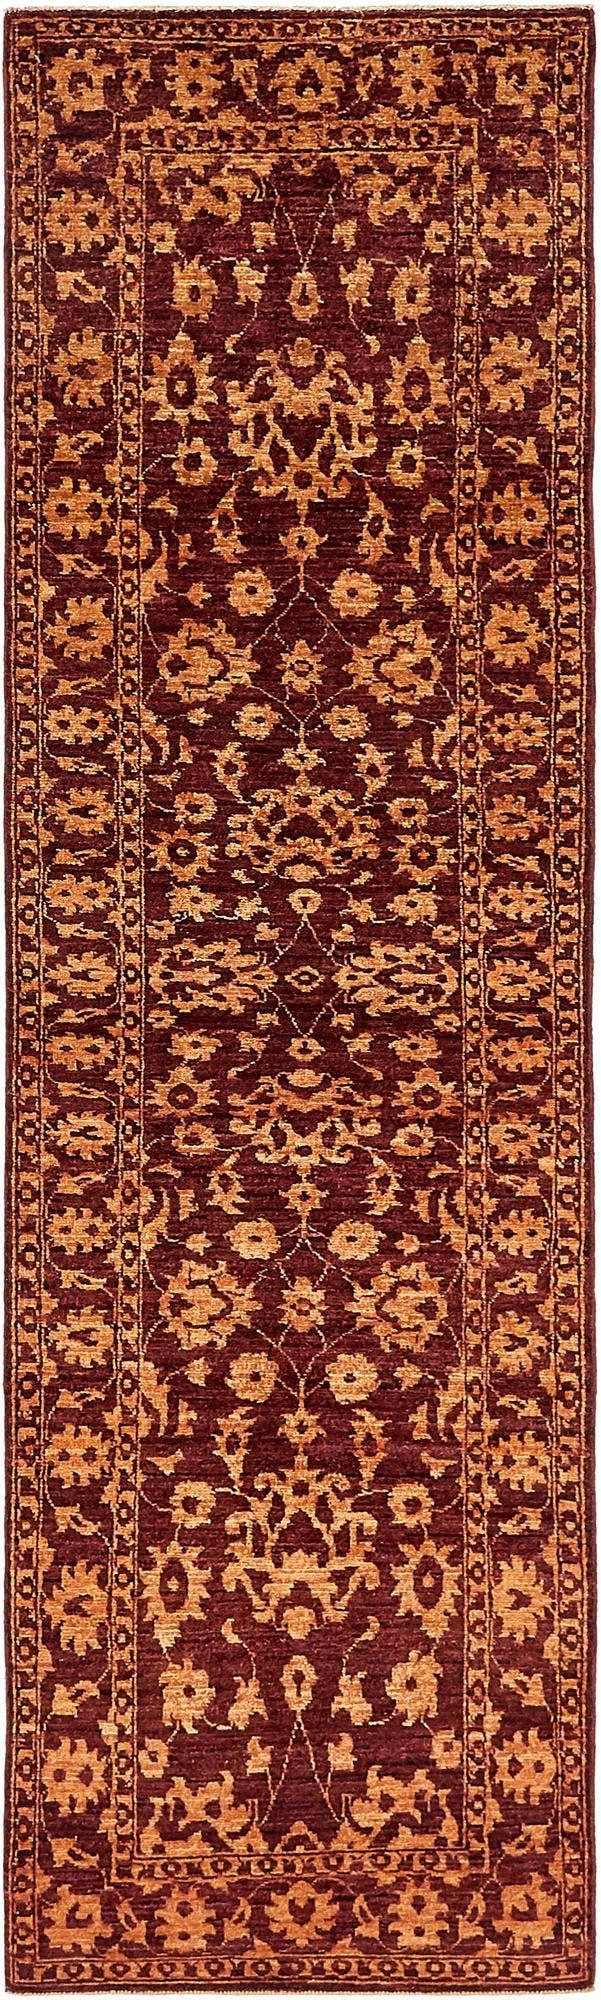 2' 6 x 9' 4 Peshawar Ziegler Oriental Runner Rug main image